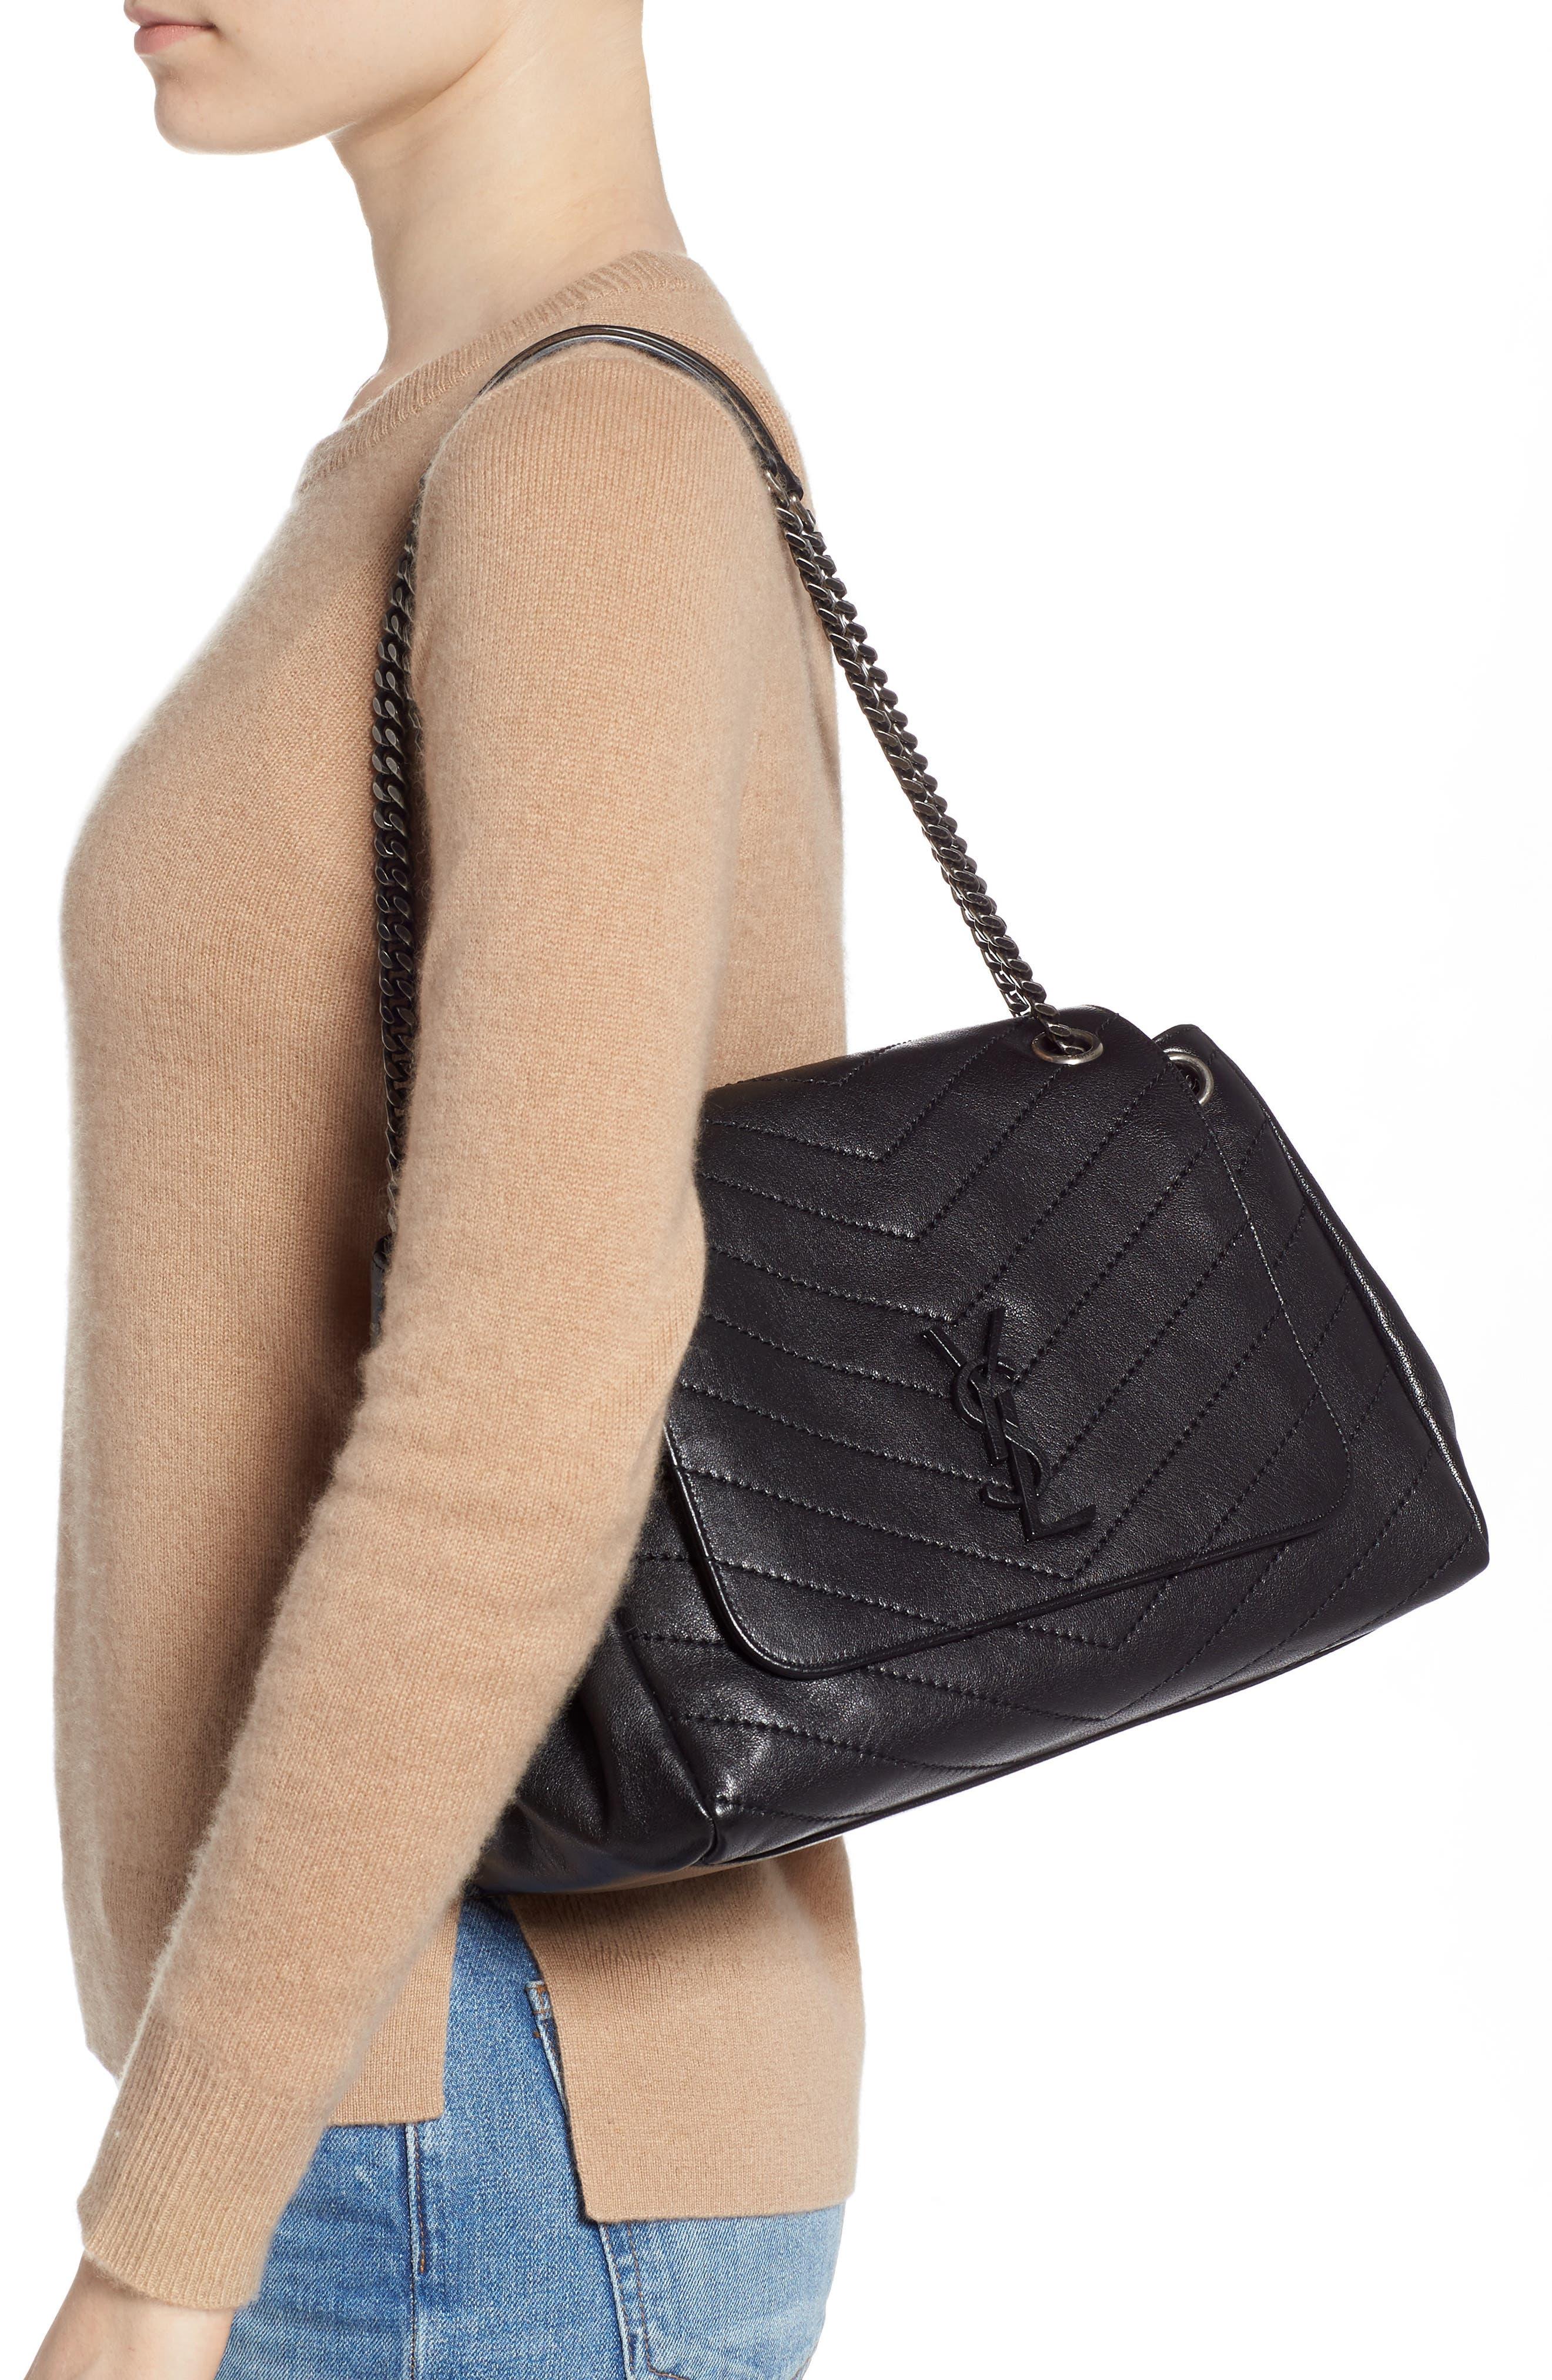 Nolita Large Leather Shoulder Bag,                             Alternate thumbnail 2, color,                             NOIR